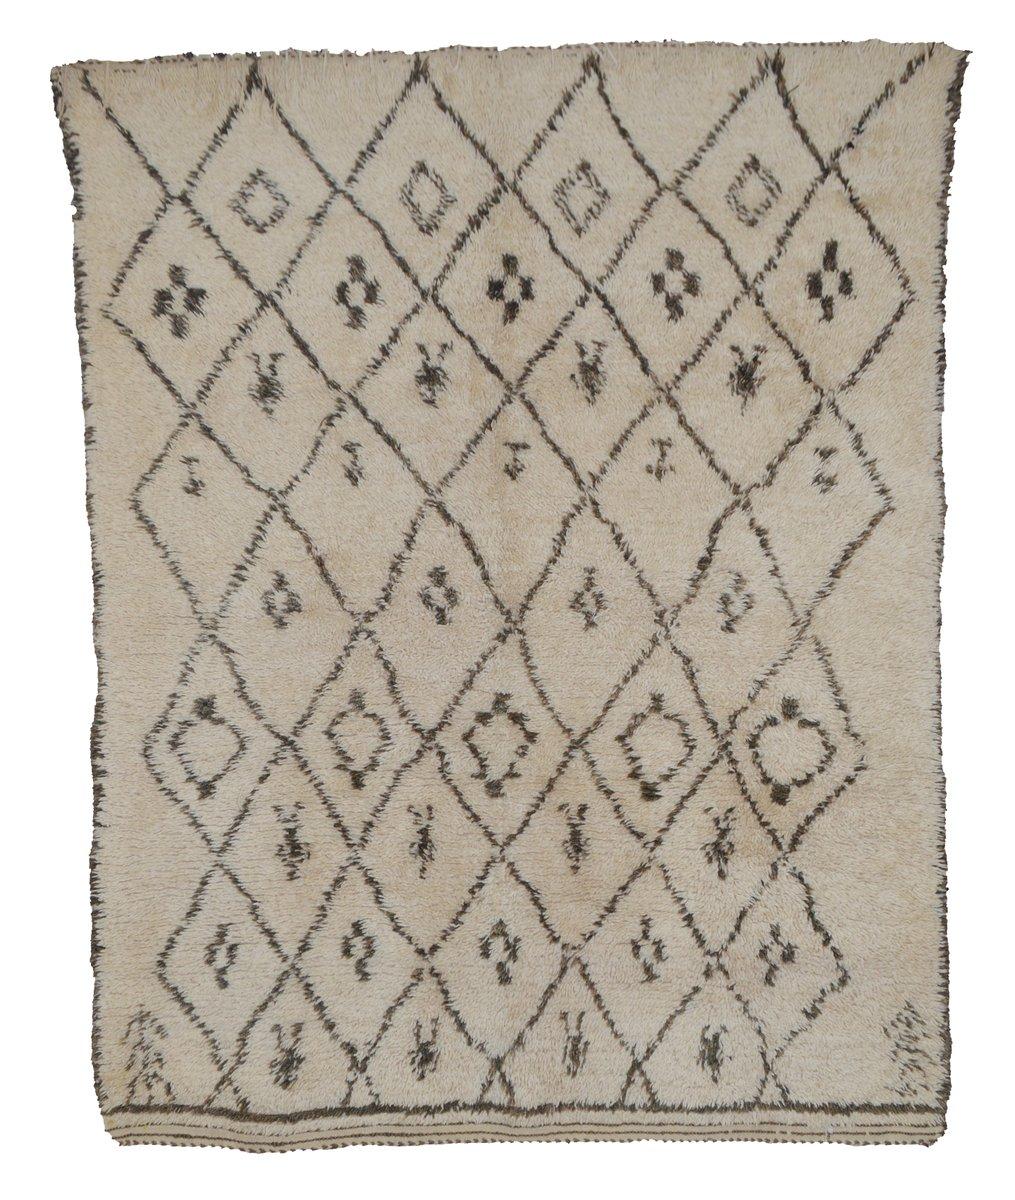 beni ourain berber rug 1970s for sale at pamono. Black Bedroom Furniture Sets. Home Design Ideas